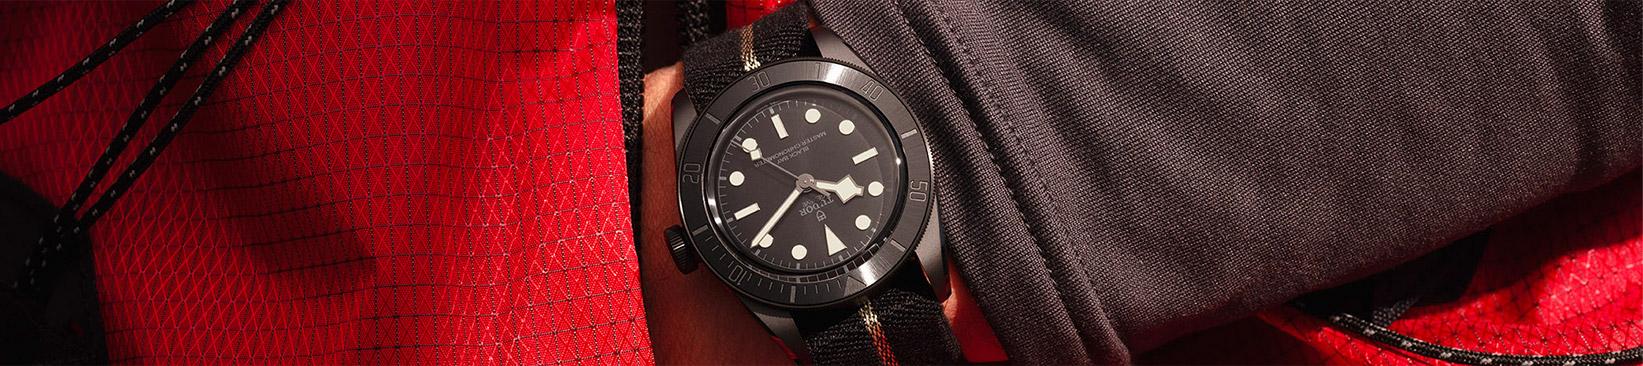 1.Tudor-Black-Bay-Chrono_Mobile